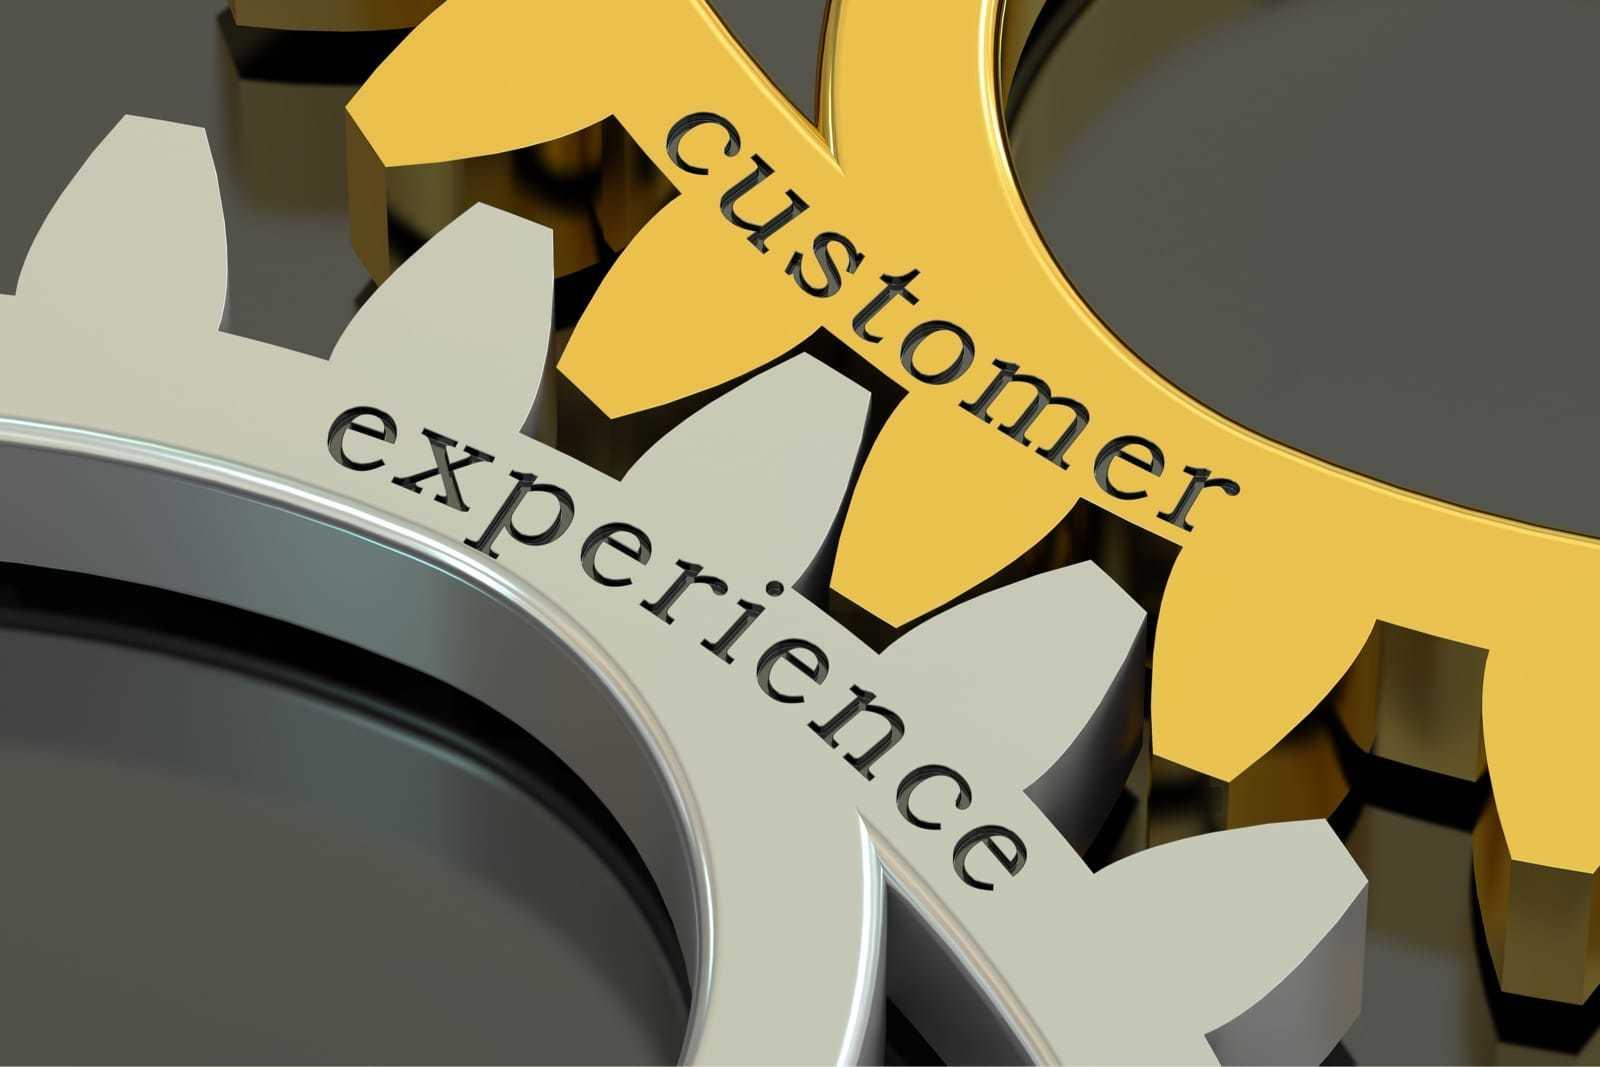 Customer Experienceと書かれた部品